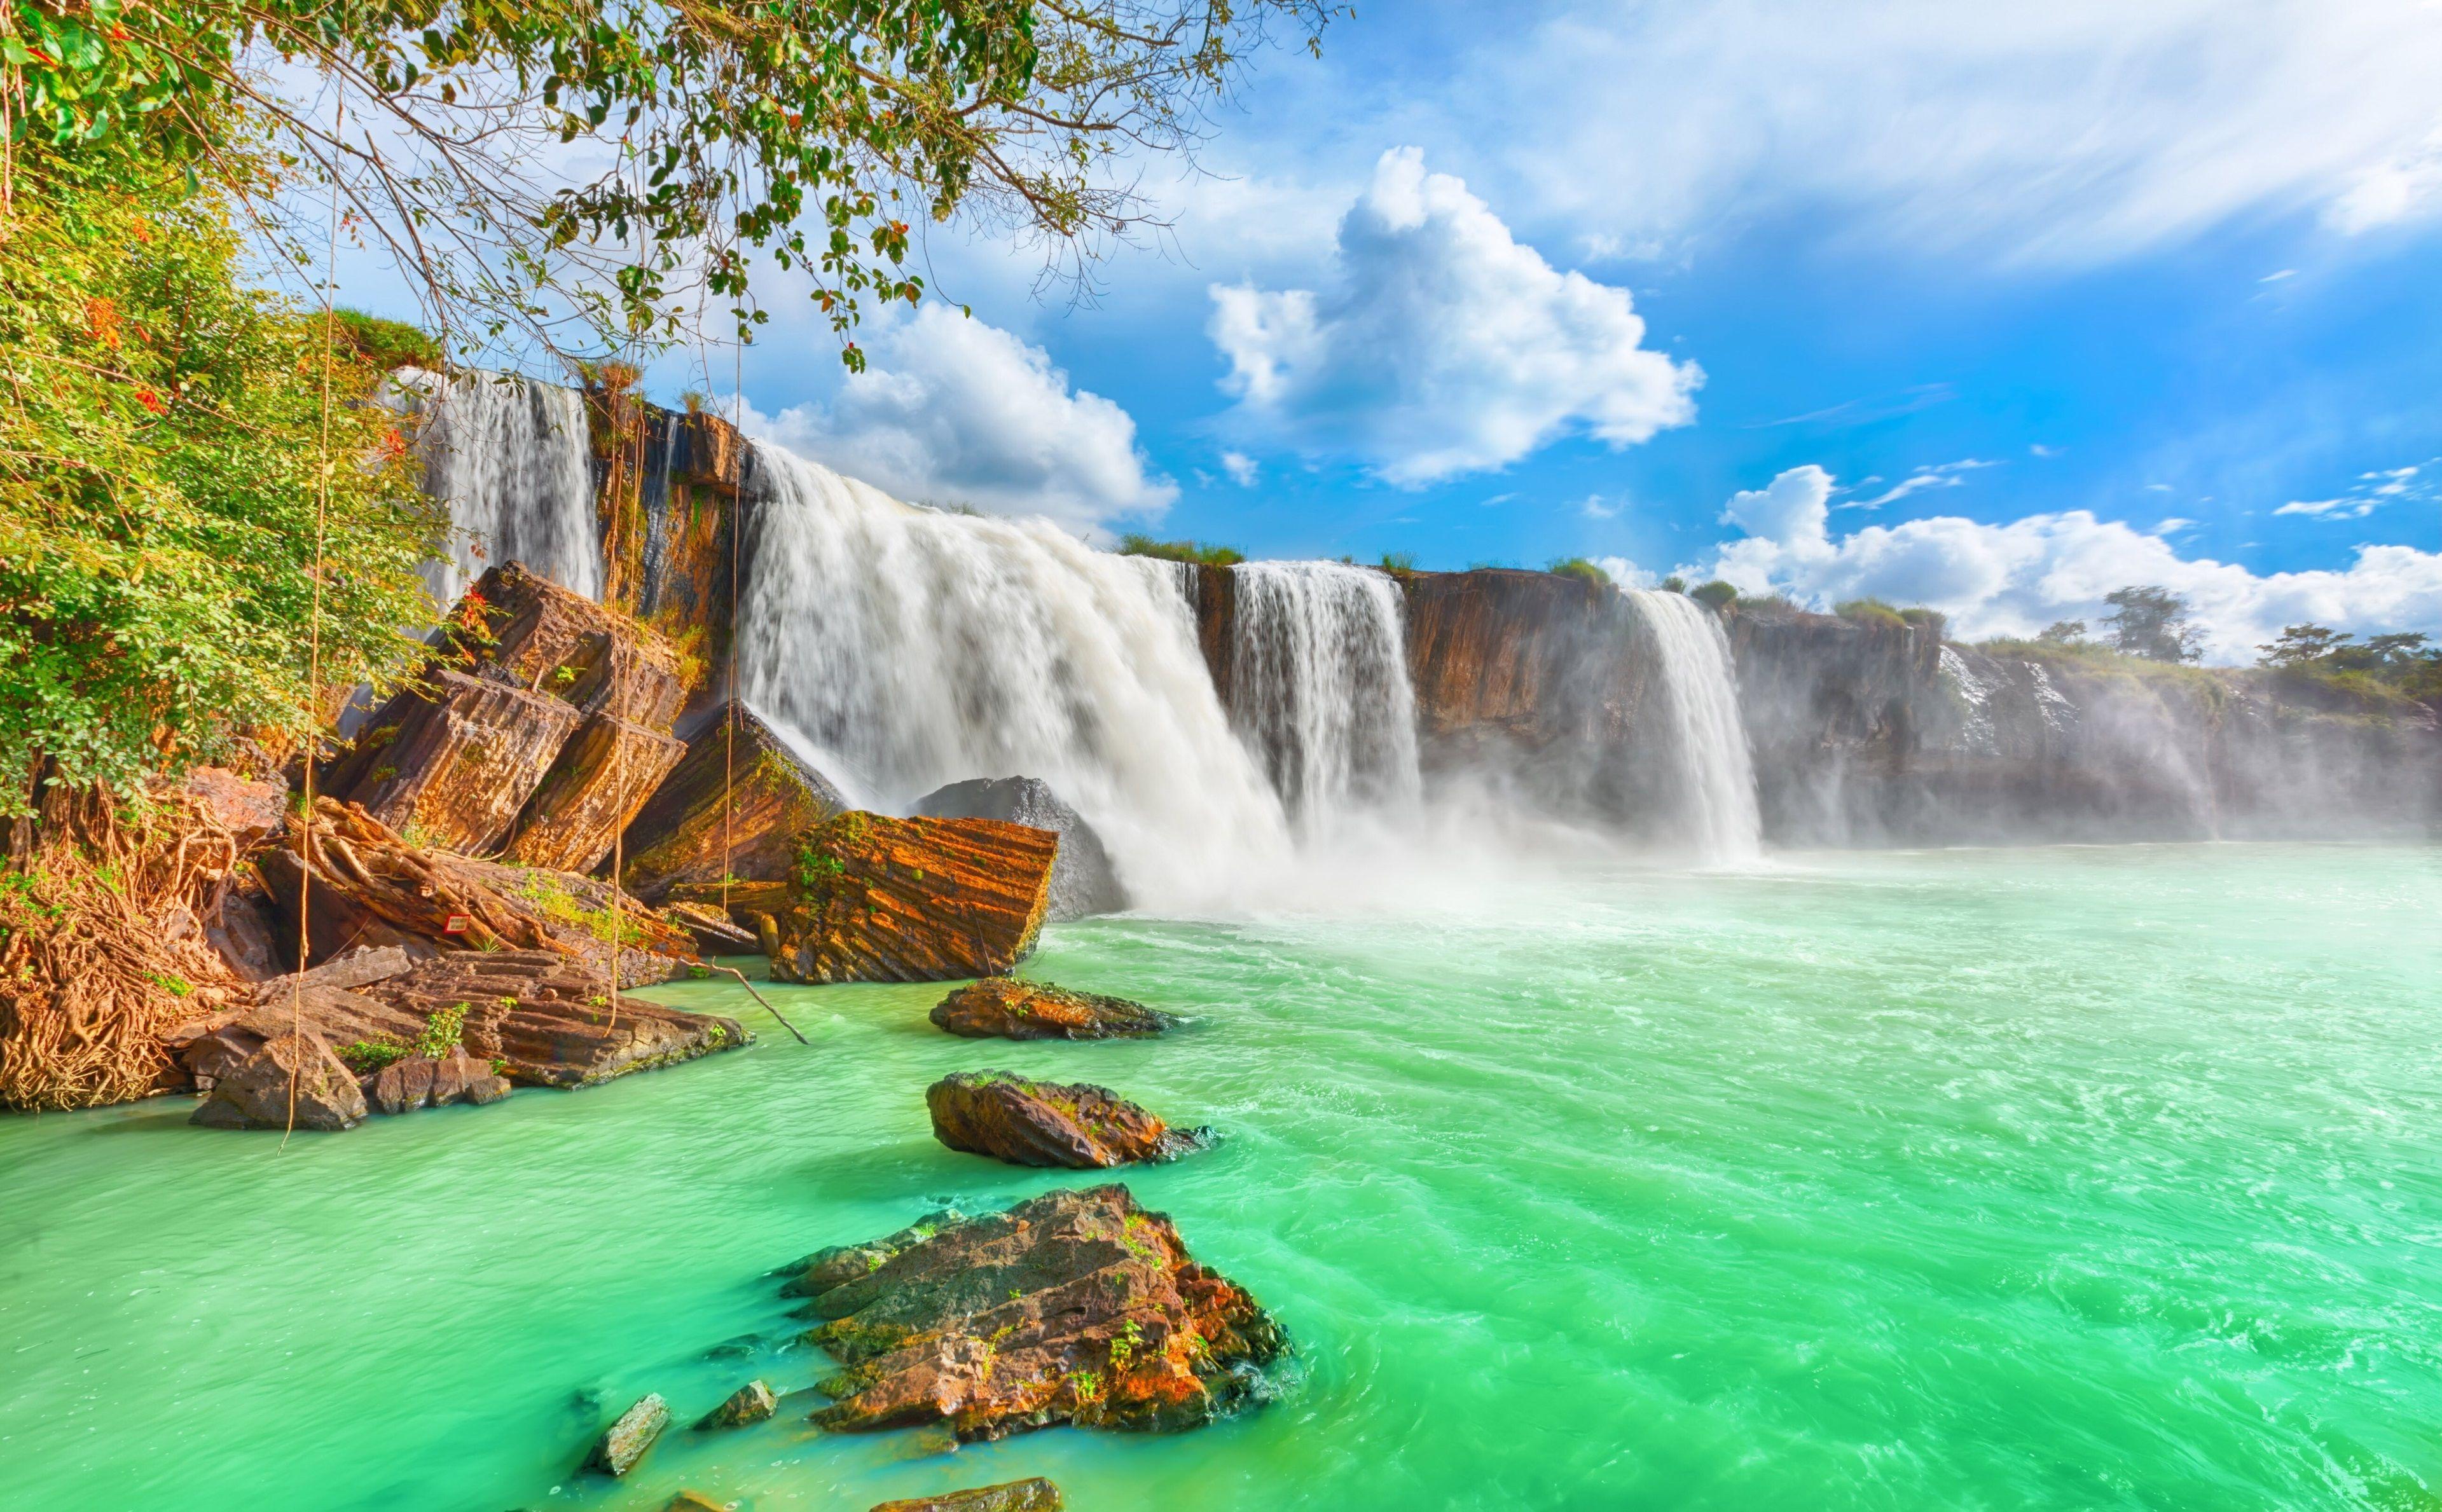 3840x2378 Waterfall 4k Wallpaper Desktop Free Waterfall Wallpaper Waterfall Waterfall Wall